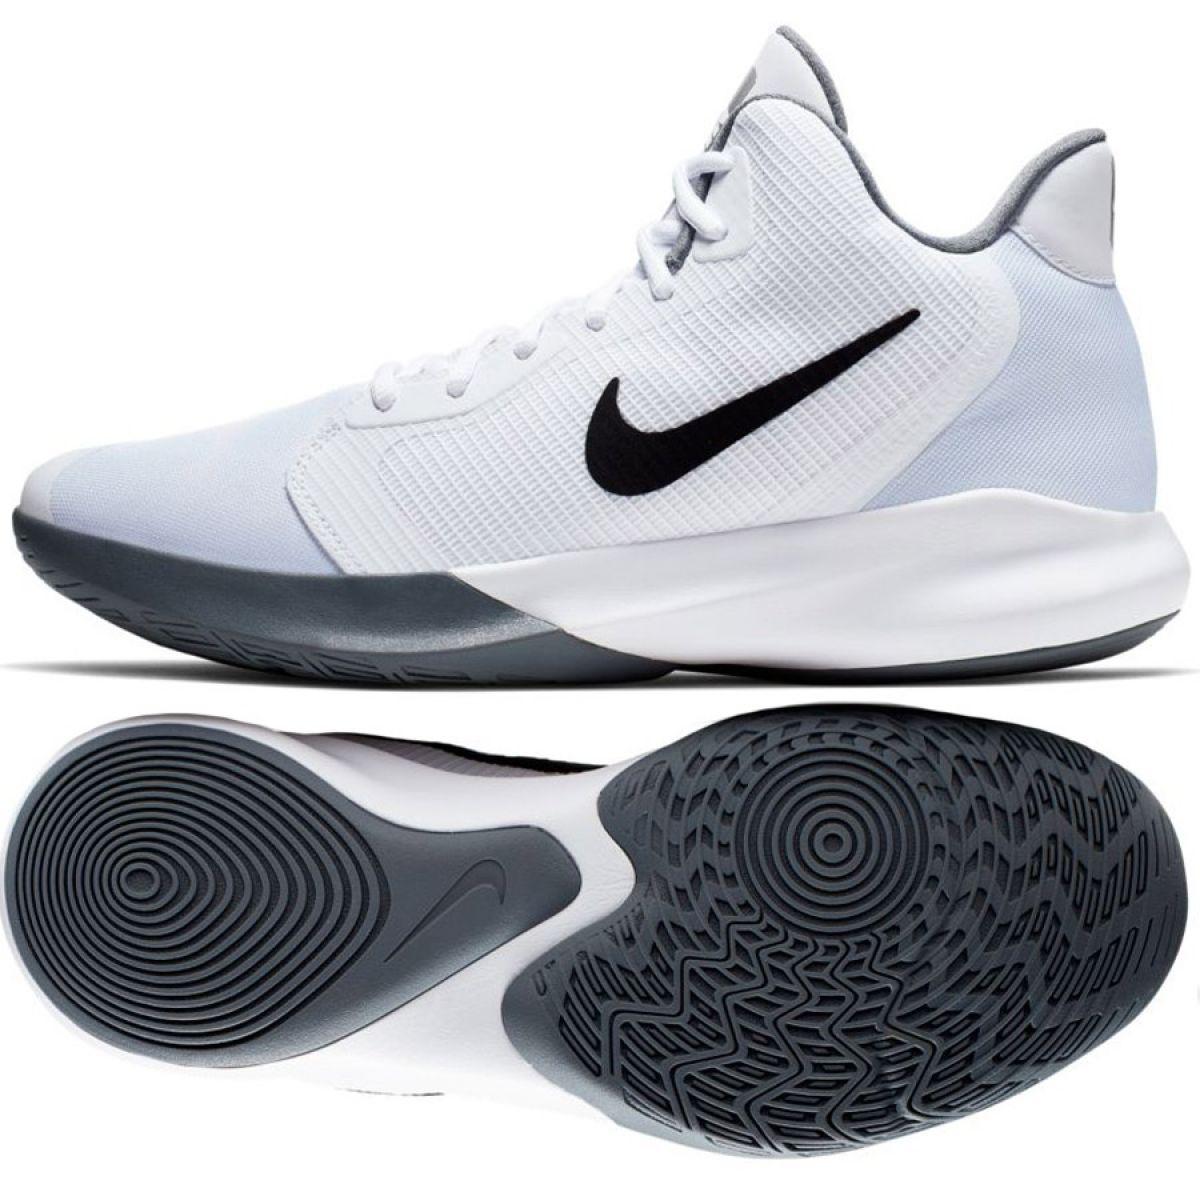 Nike Precision Iii M AQ7495 100 cipő fehér fehér